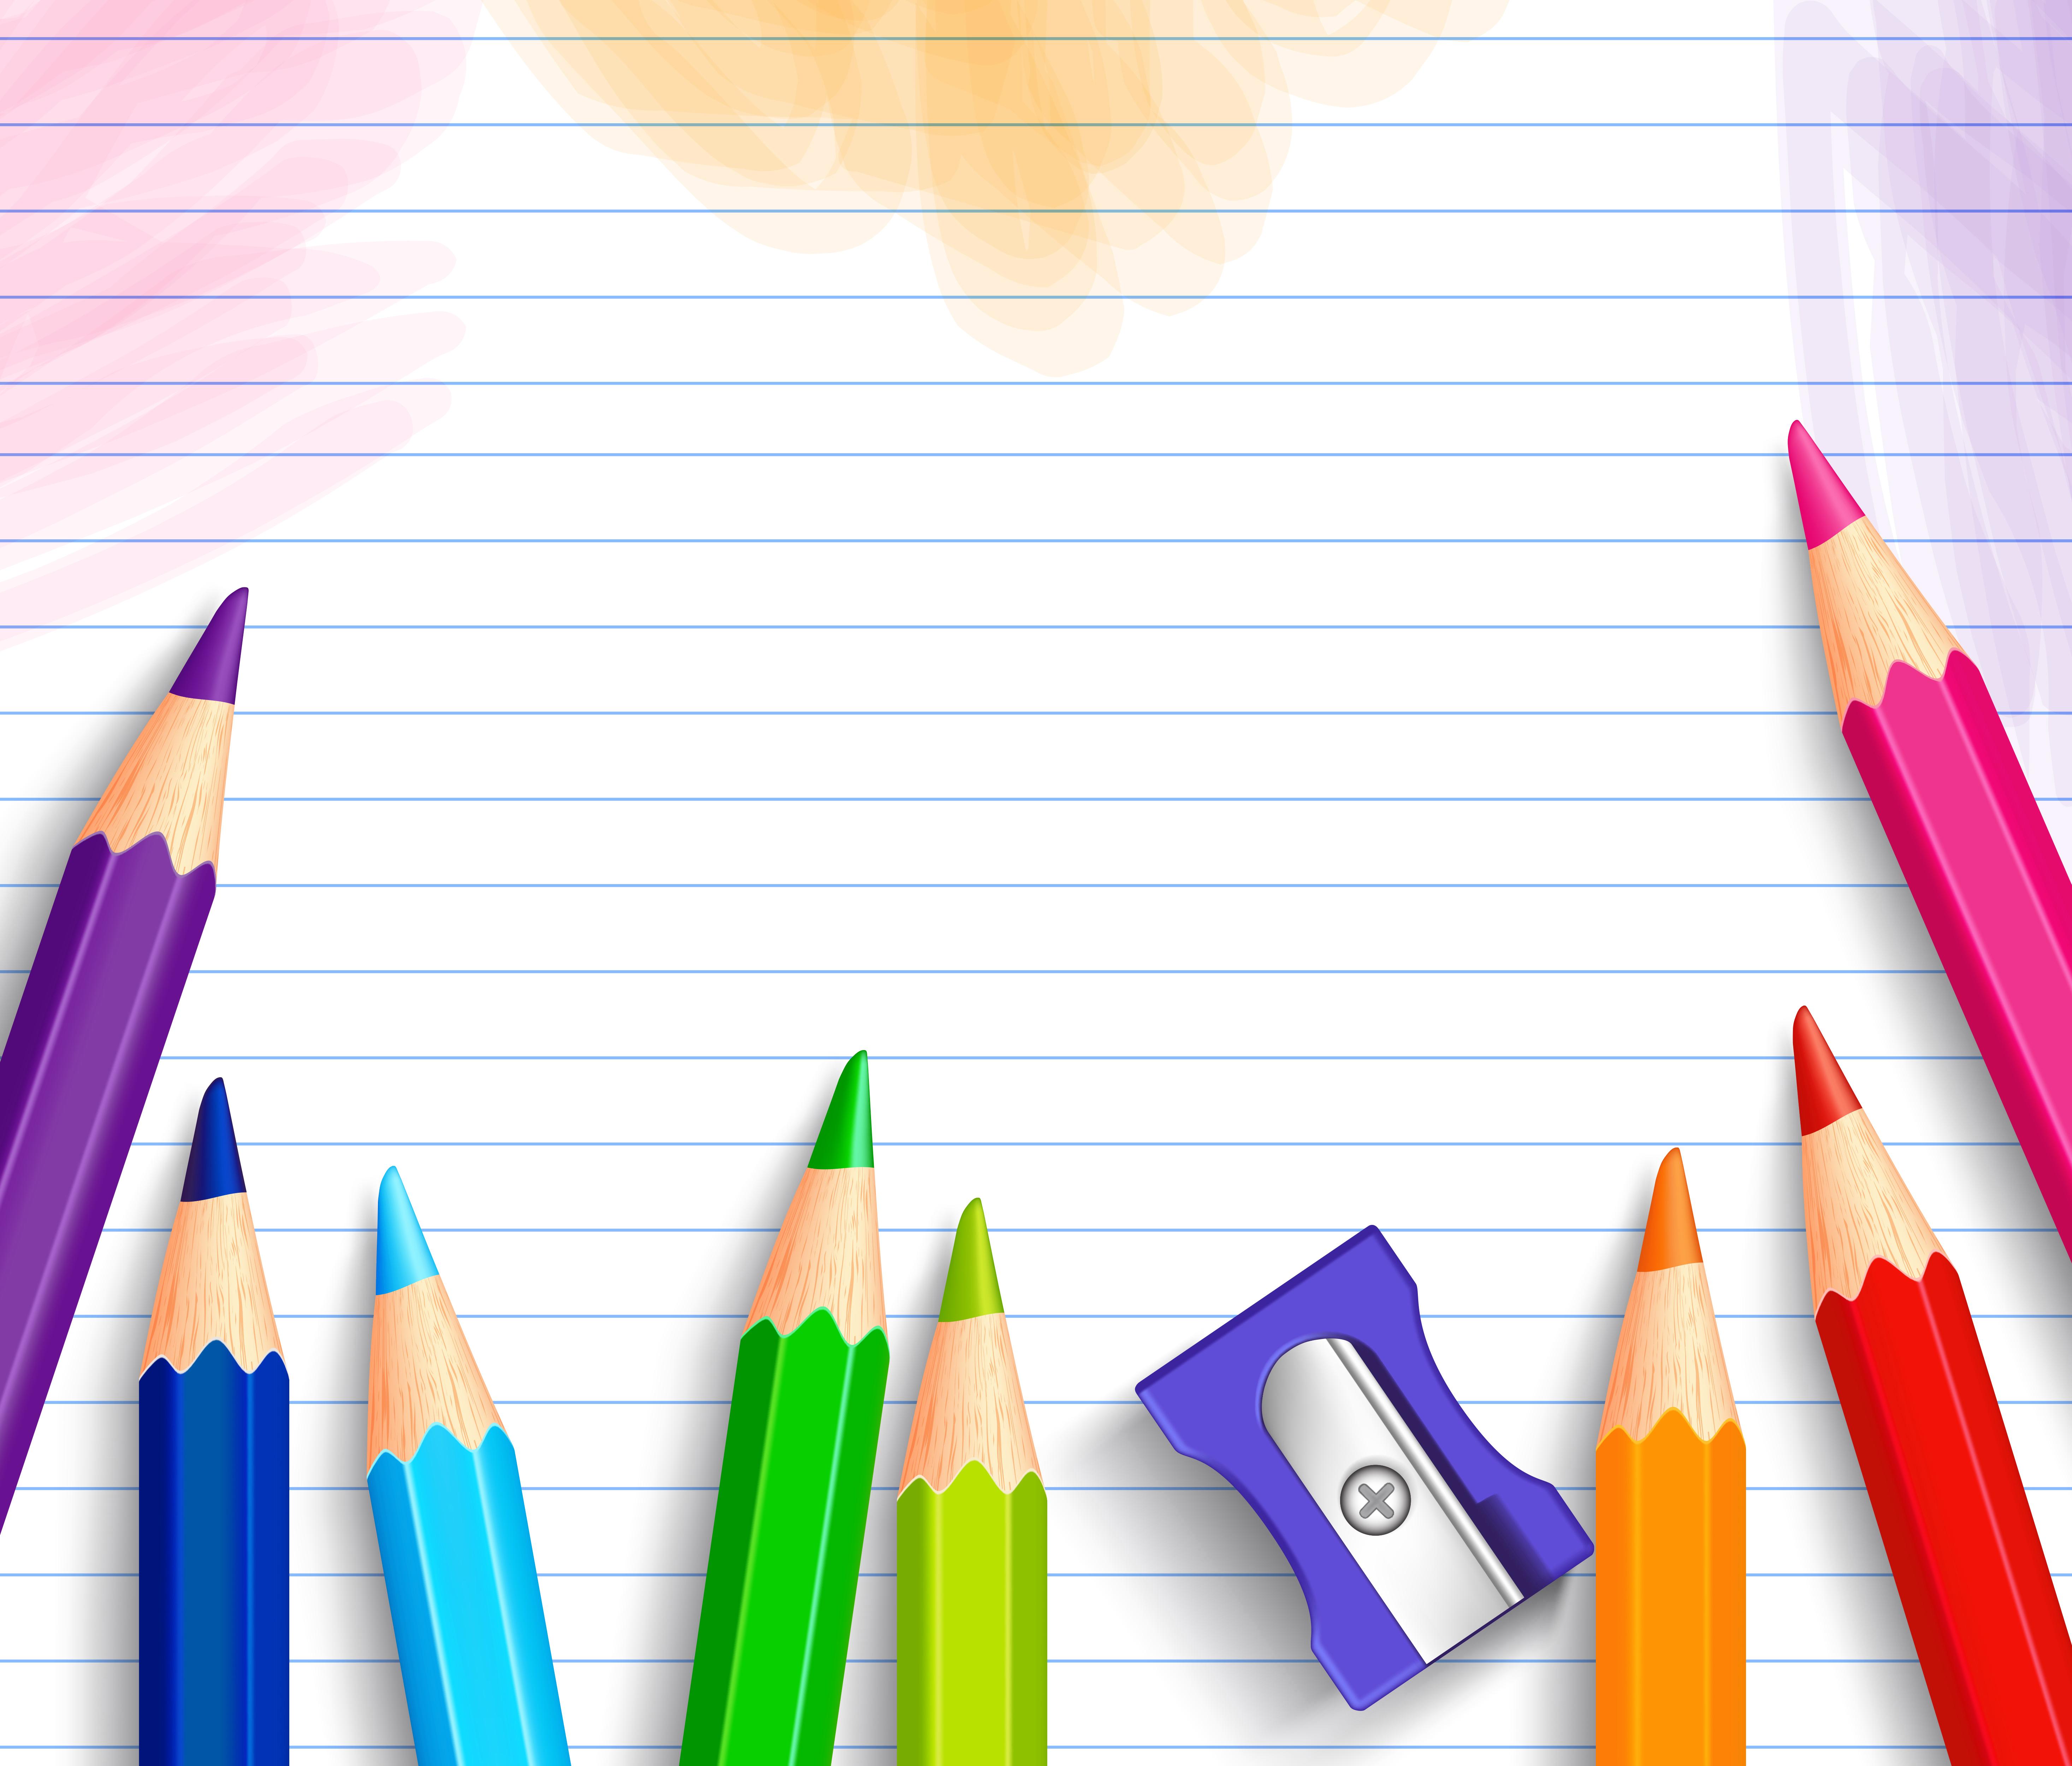 School Background With Pencils M 1439930300 School Clipart Background 5866x5000 Download Hd Wallpaper Wallpapertip